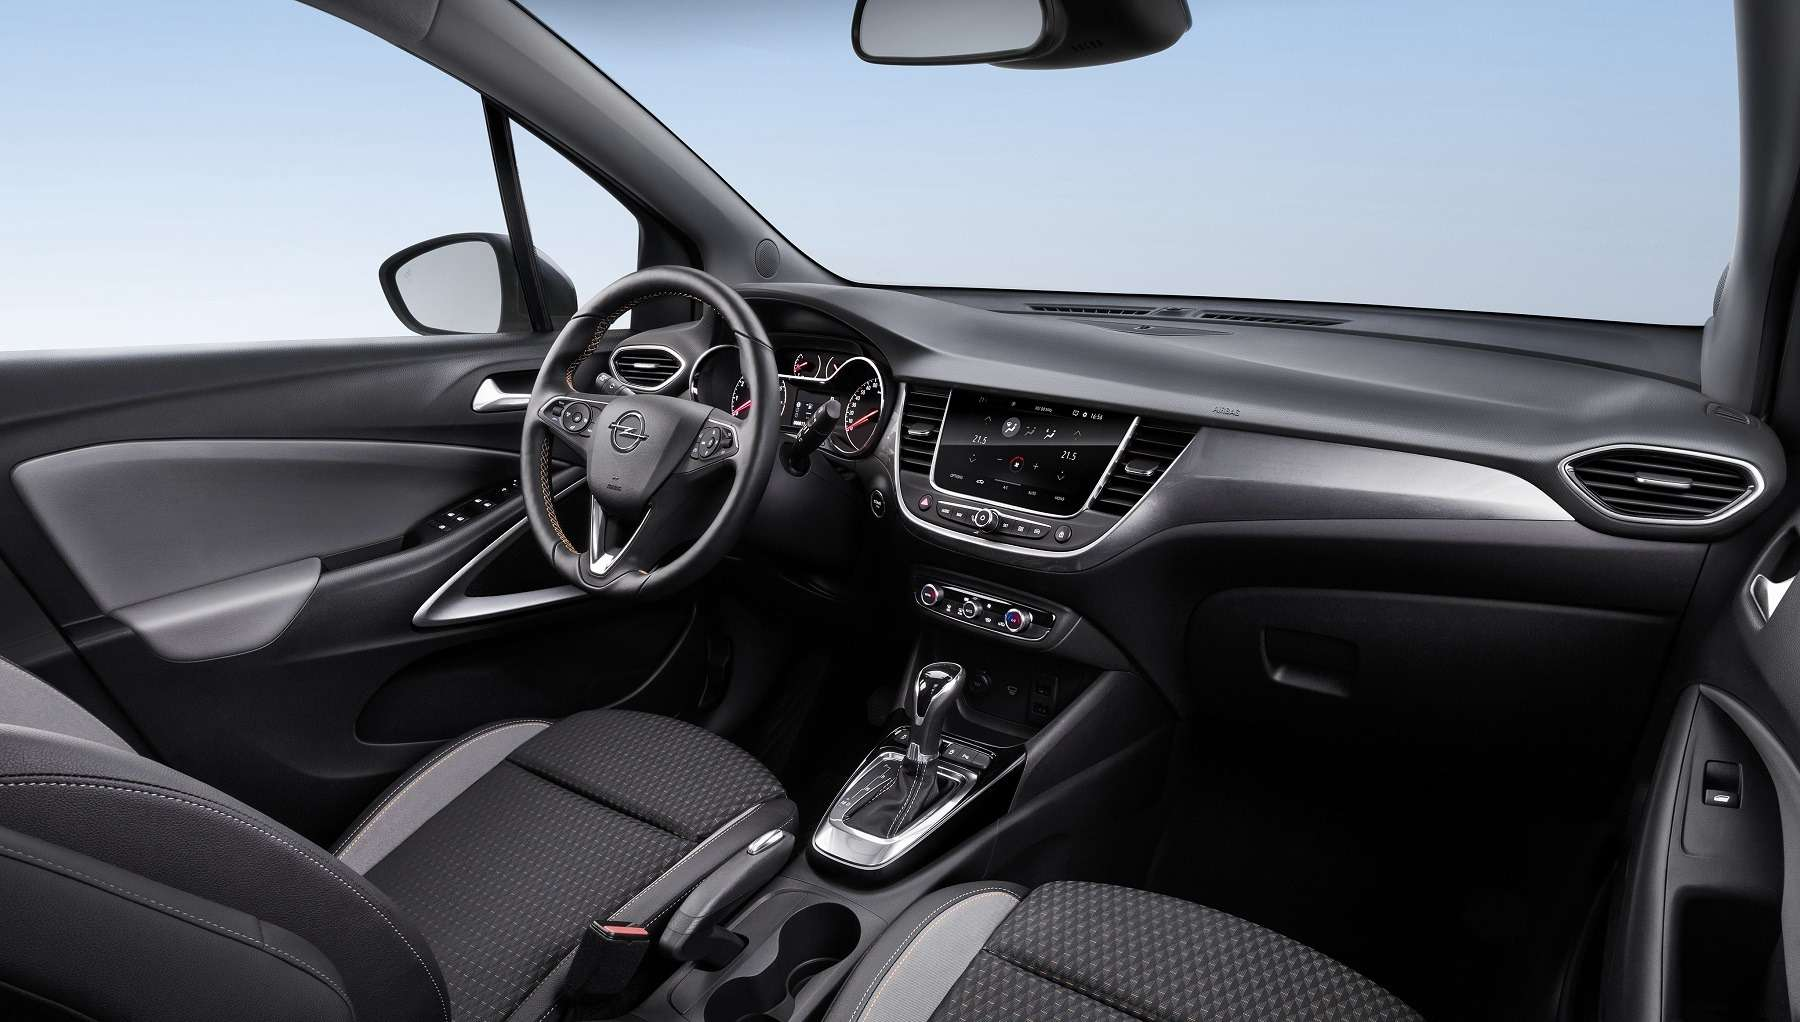 Кроссовер Opel Crossland Xпредставлен официально— фото 694502